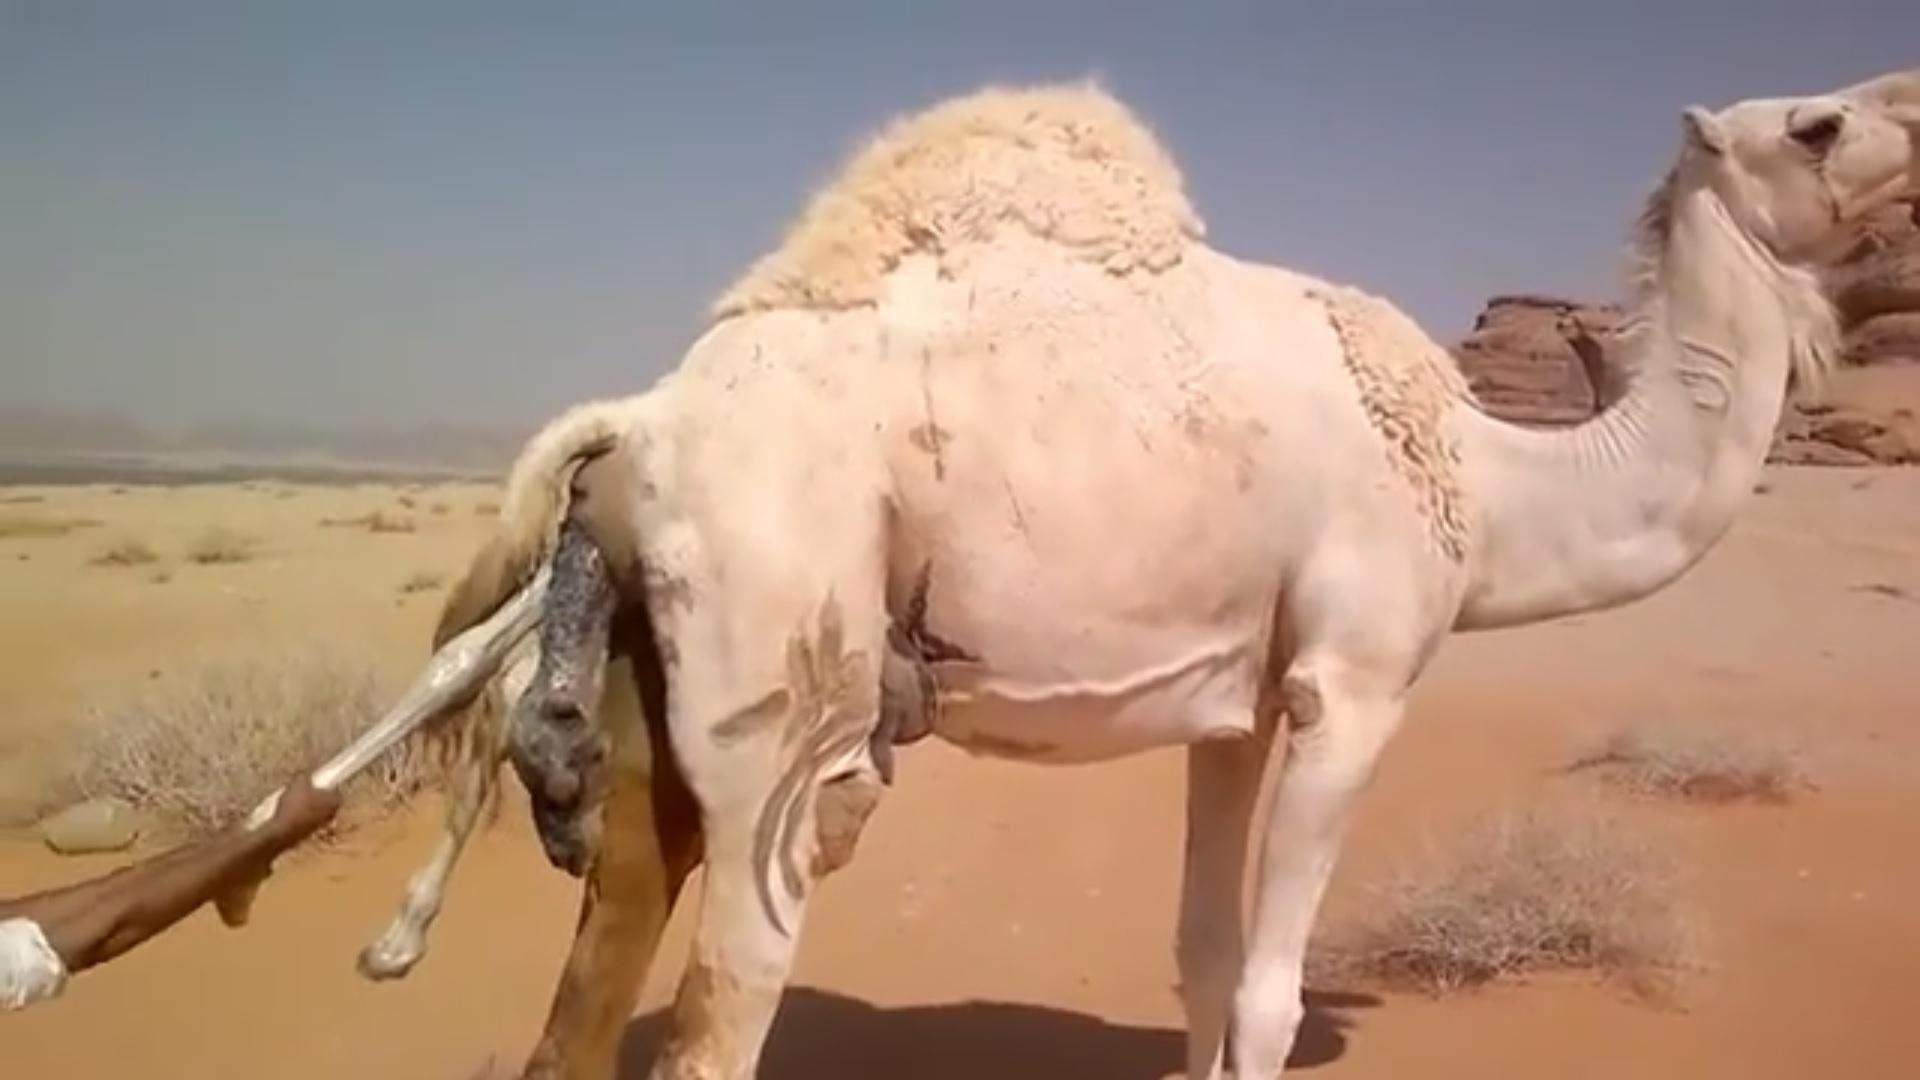 343c2f85148c61783280b1b9d93417c5 - Nacimiento de un camello